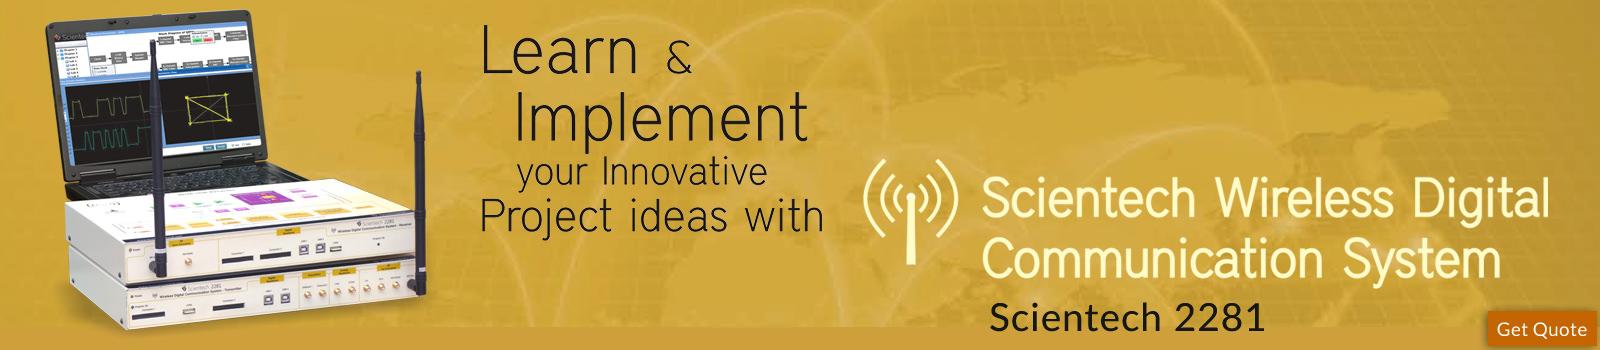 Scientech Wireless Digital Communication System